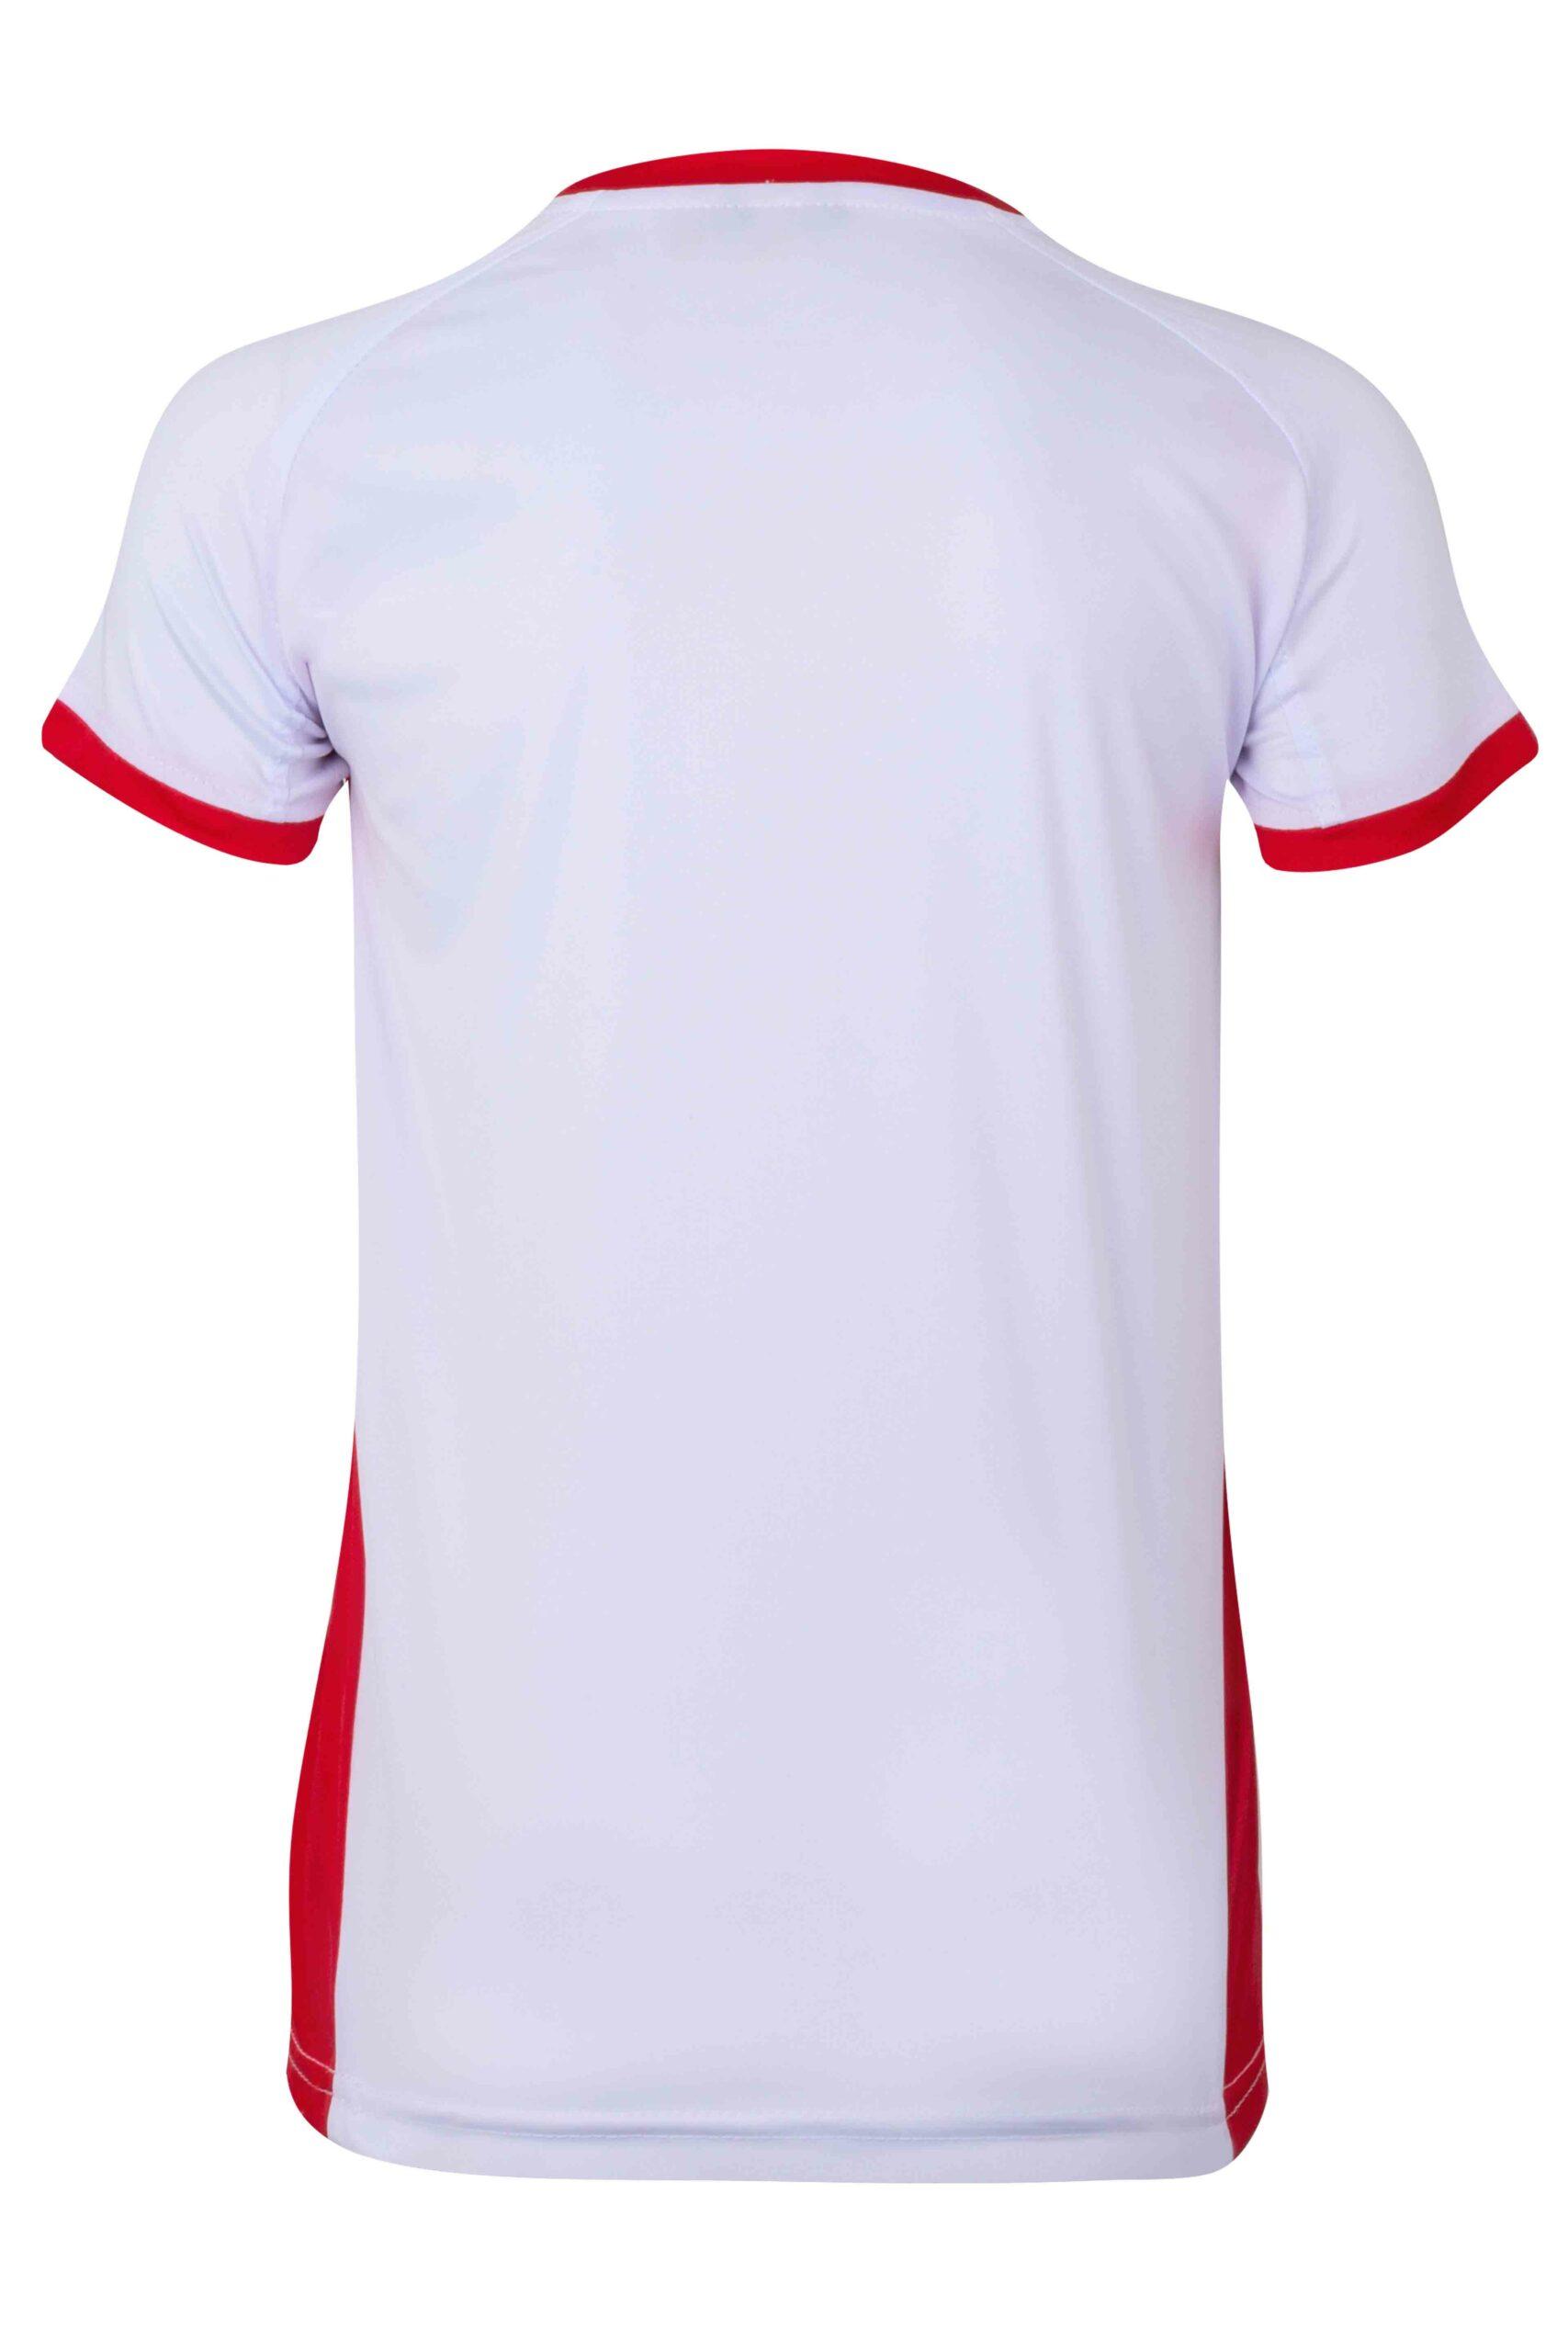 Mukua Mk531v Camiseta TÉcnica Manga Corta Bicolor NiÑo White Red 2